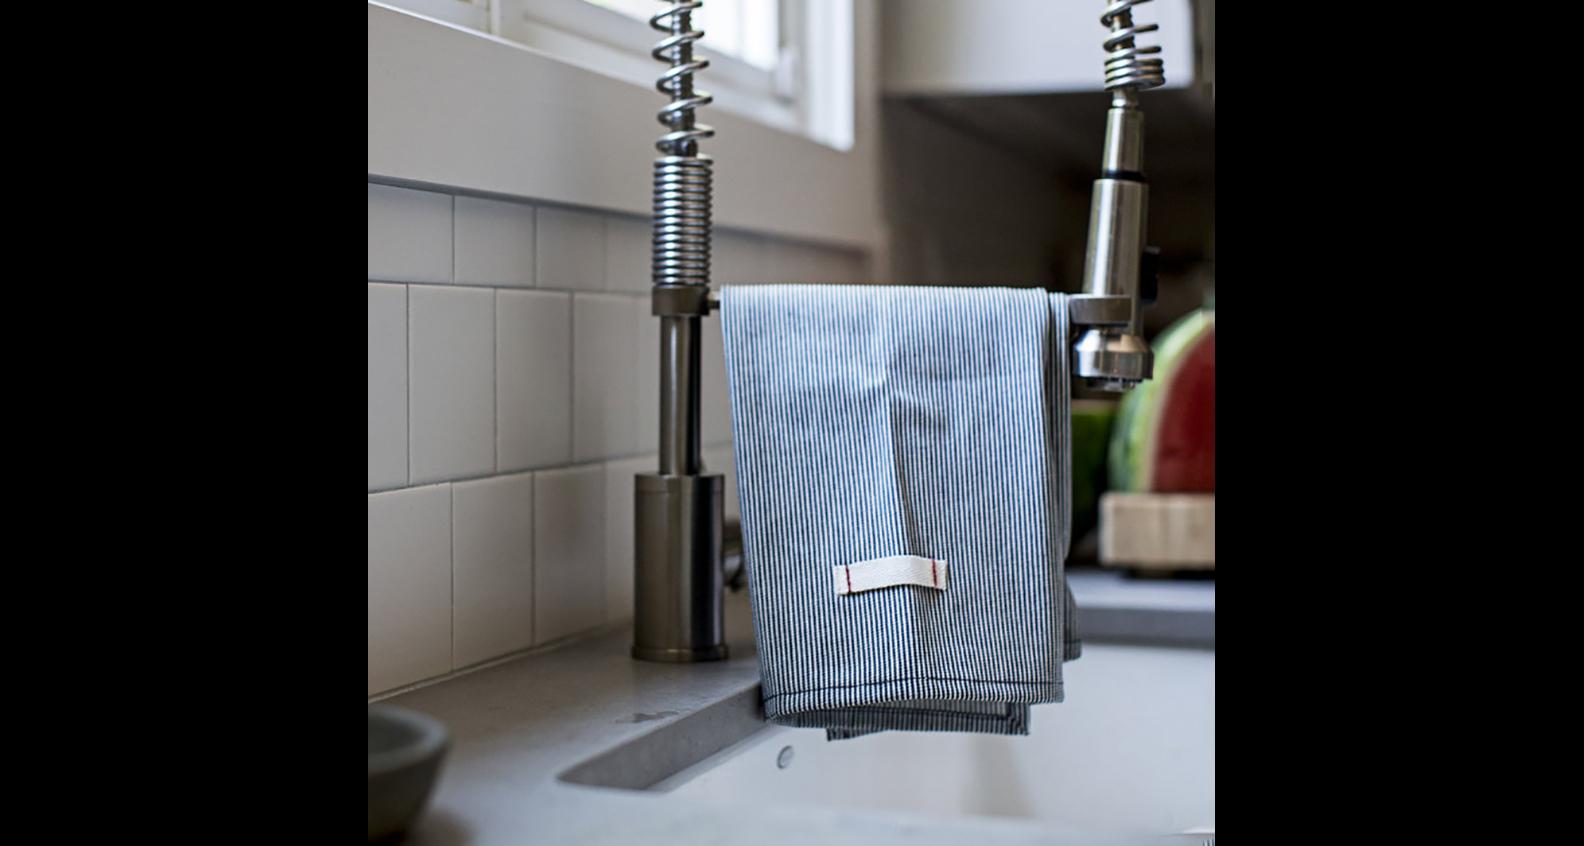 Heirloomed Railroad Stripe Tea Towels